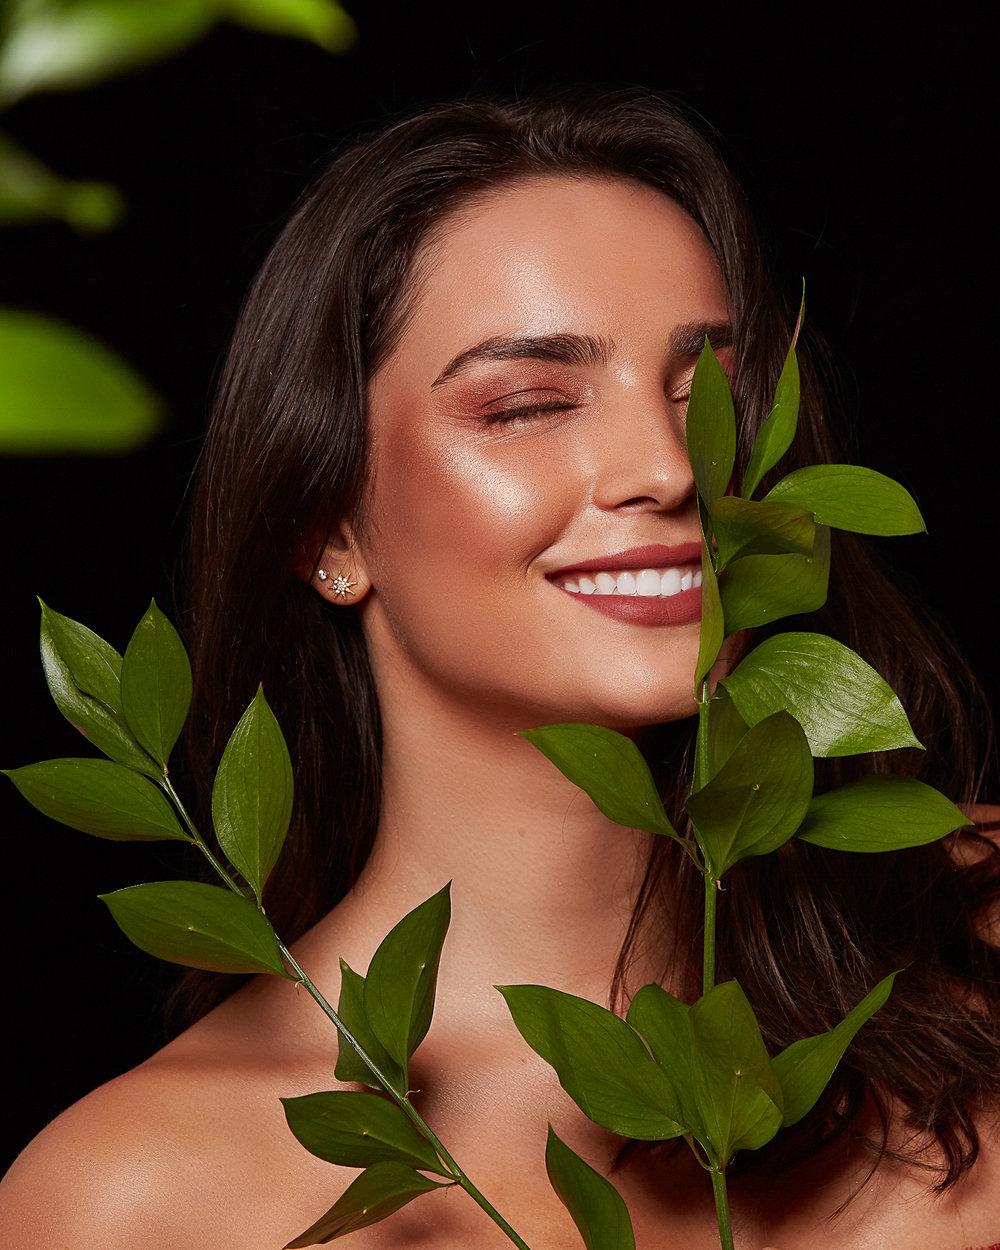 BeautywithBB-NikiCram-31.jpg